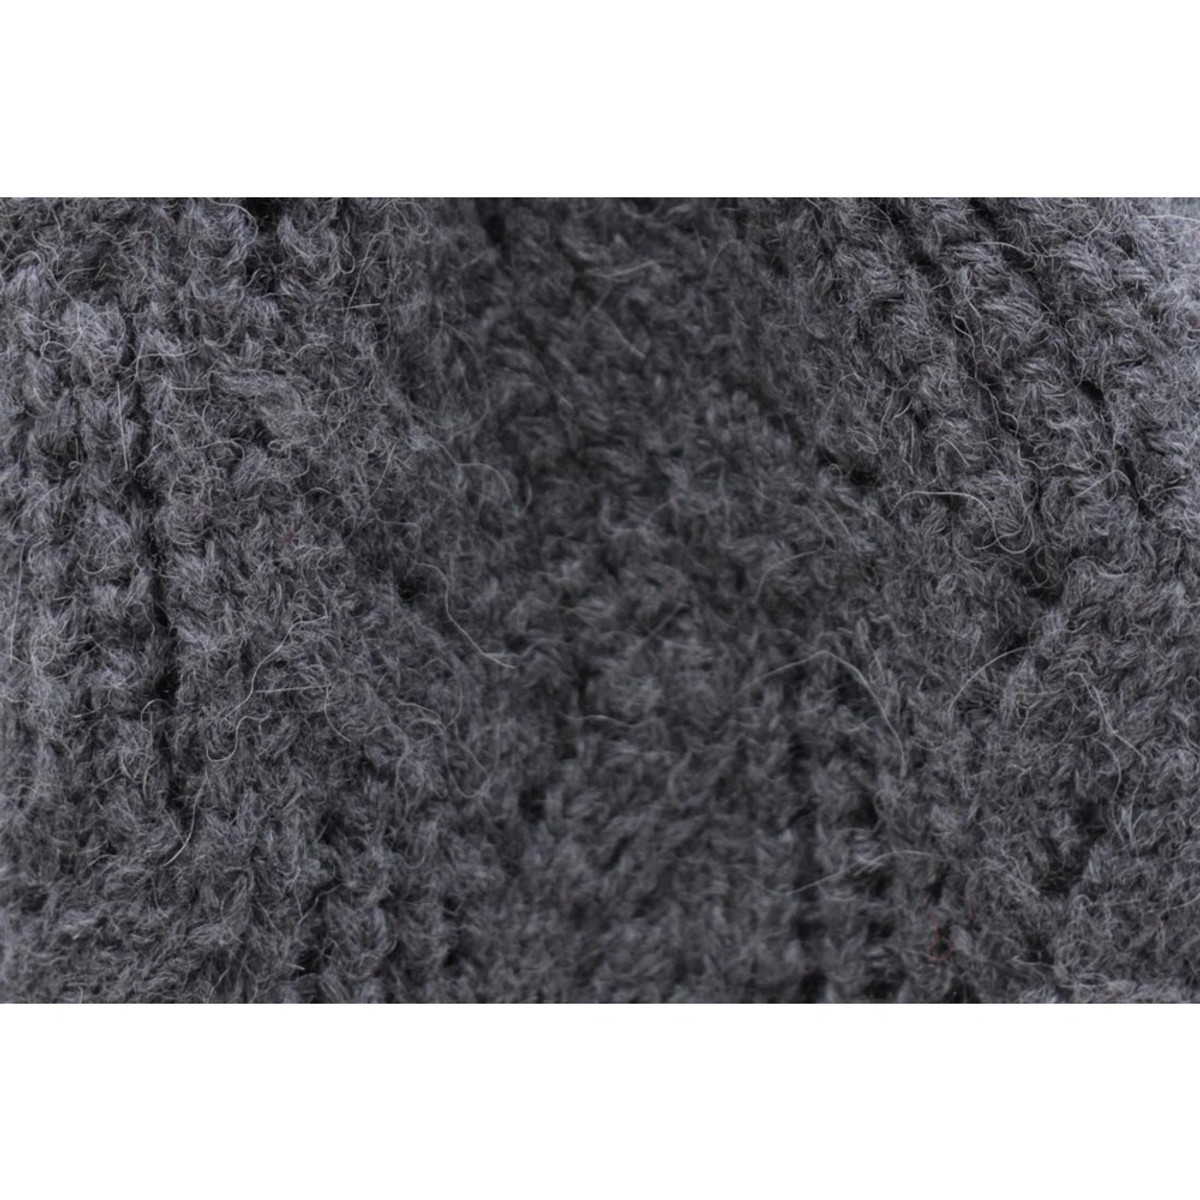 0540ed6f Superfine Hand Knitted Alpaca Wool Beanie Hat & Chunky Scarf Charcoal Gray  (33B-040